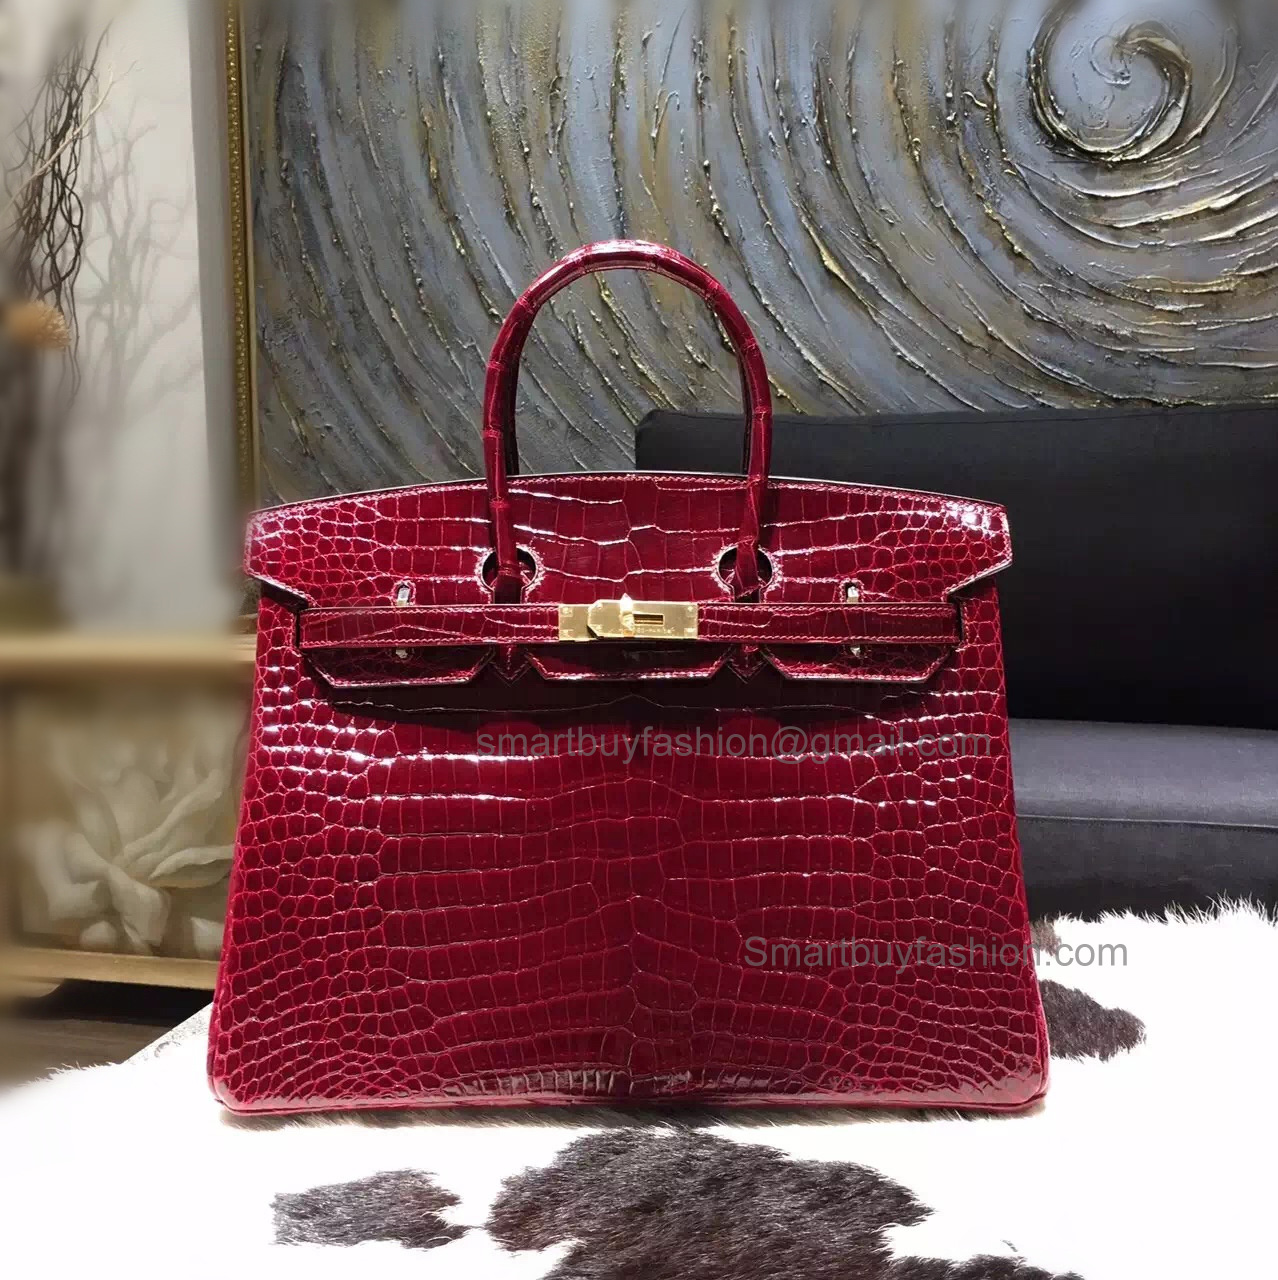 47a85b9e83f9 Hand Stitched Hermes Birkin 35 Bag in ck57 Bordeaux Shining Porosus Croc GHW